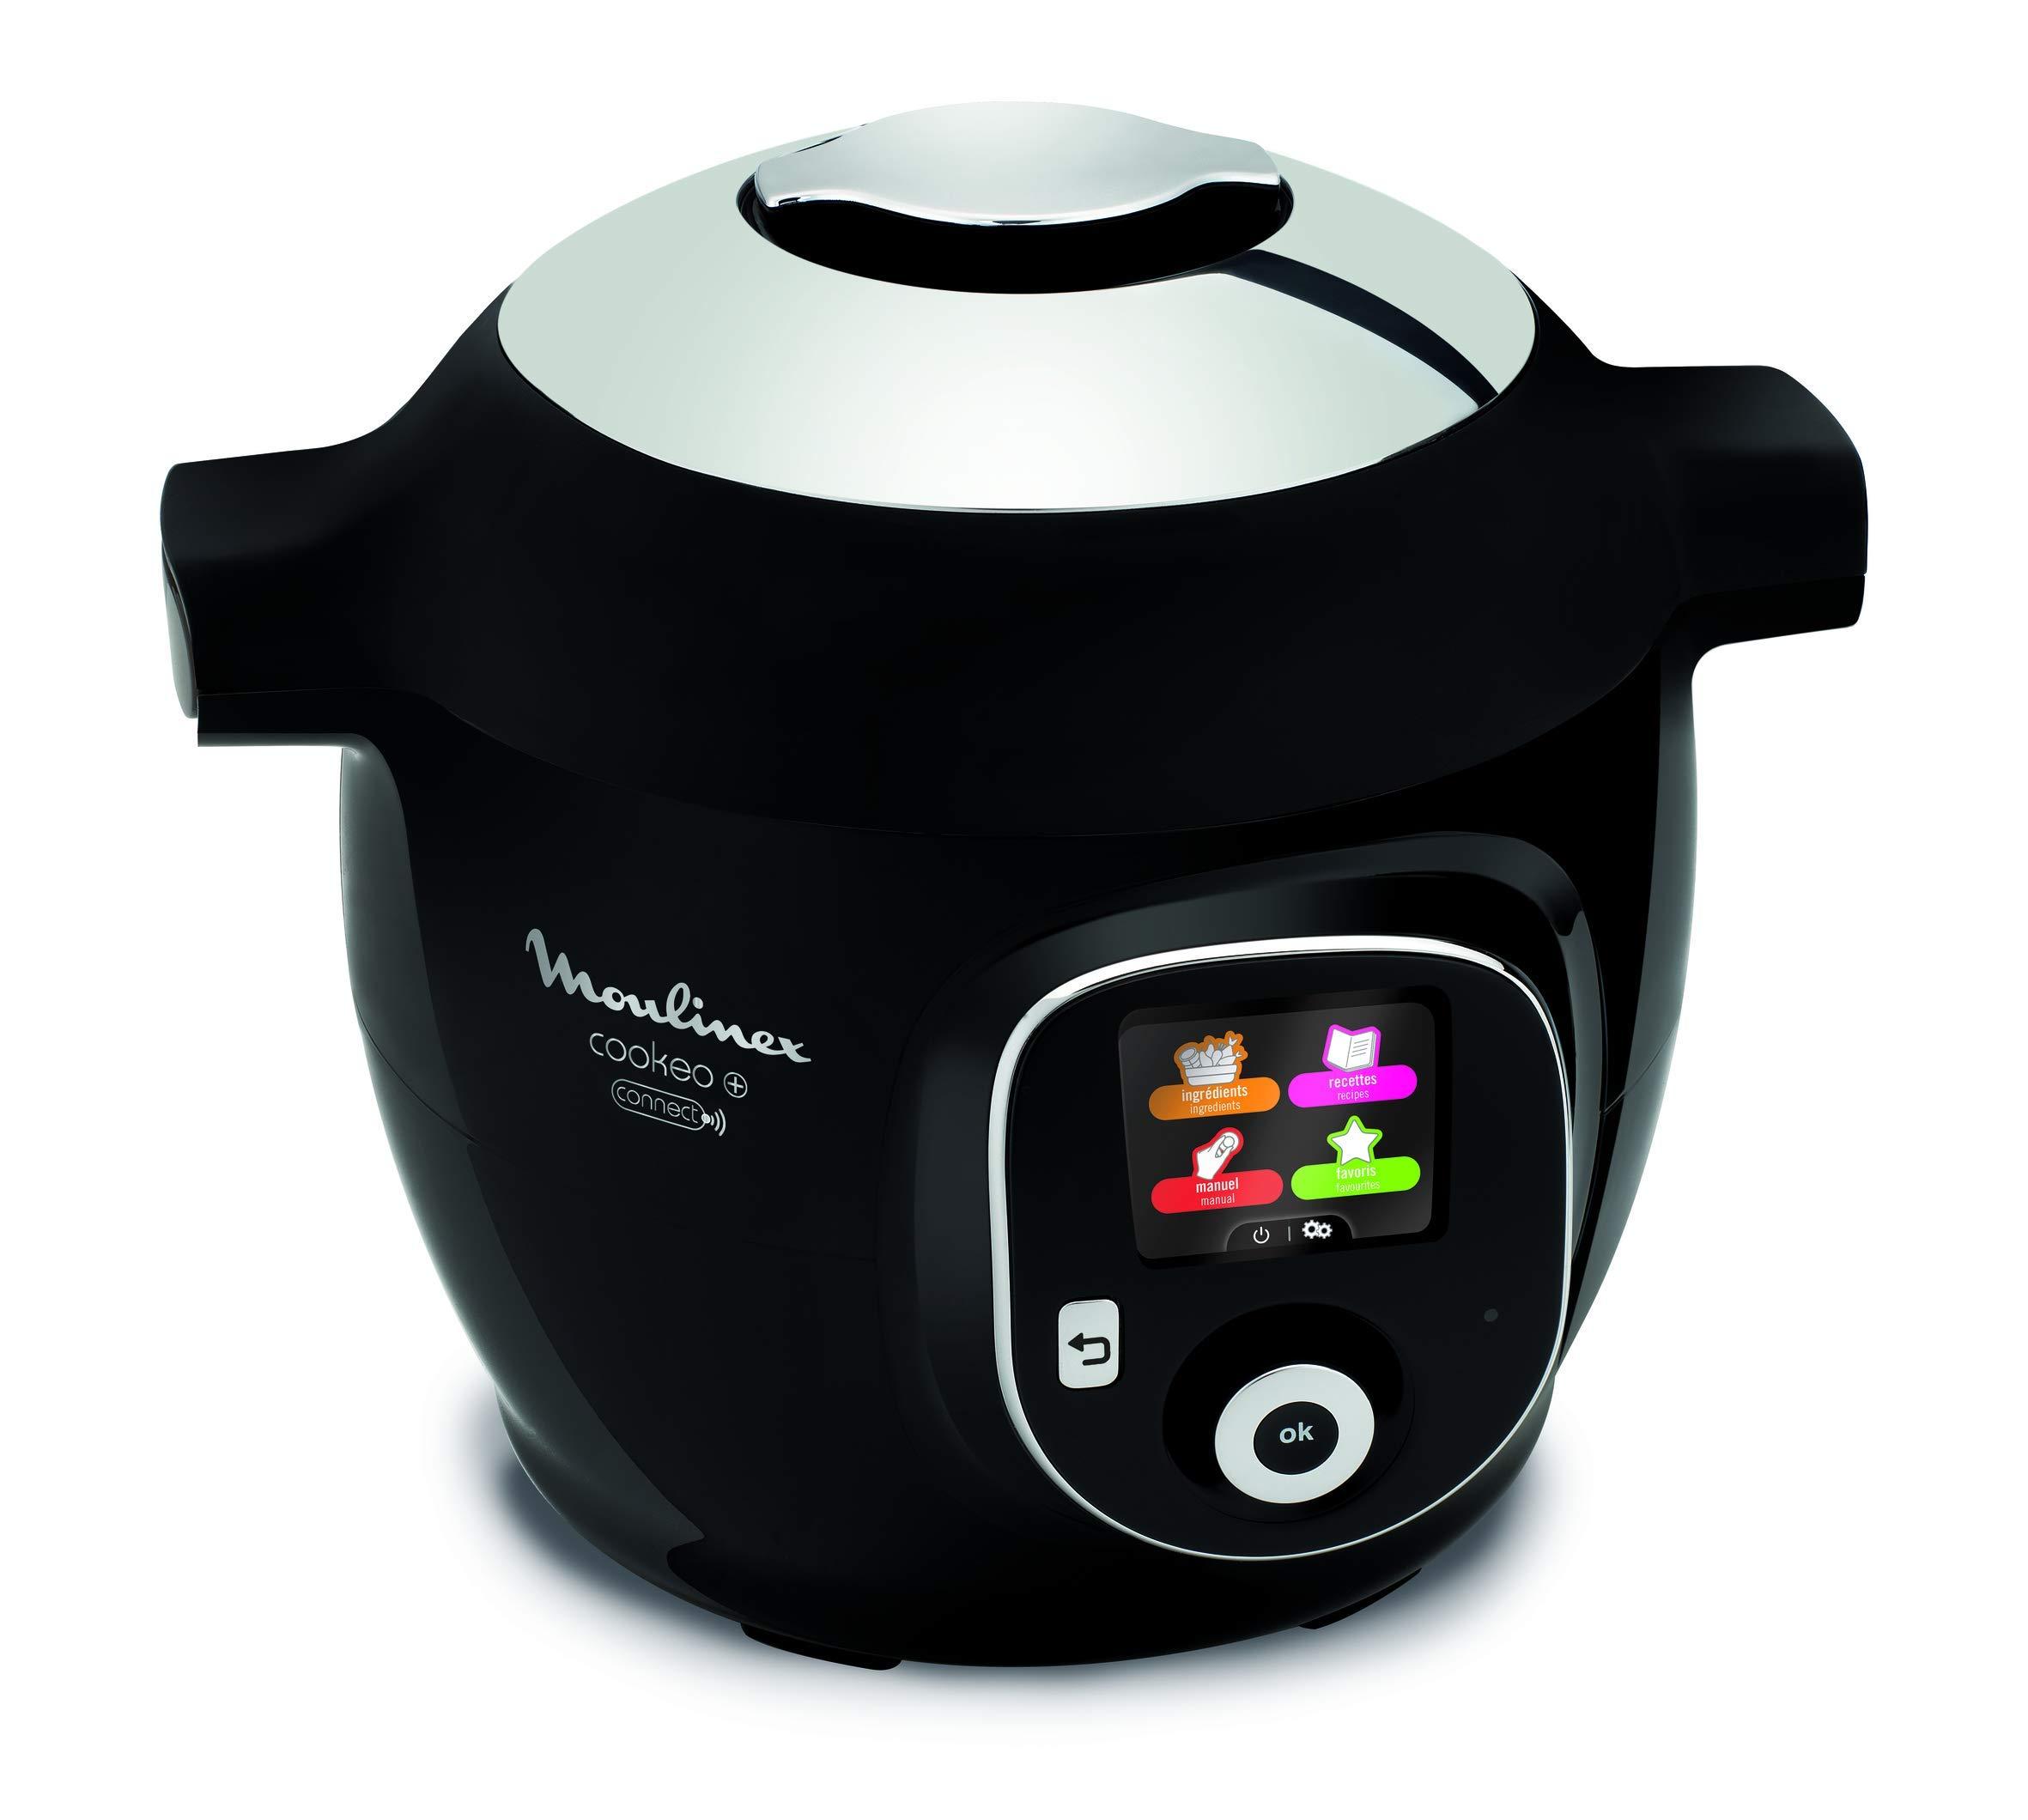 Moulinex Cookeo + Connect olla multi-cocción 6 L 1200 W Negro ...